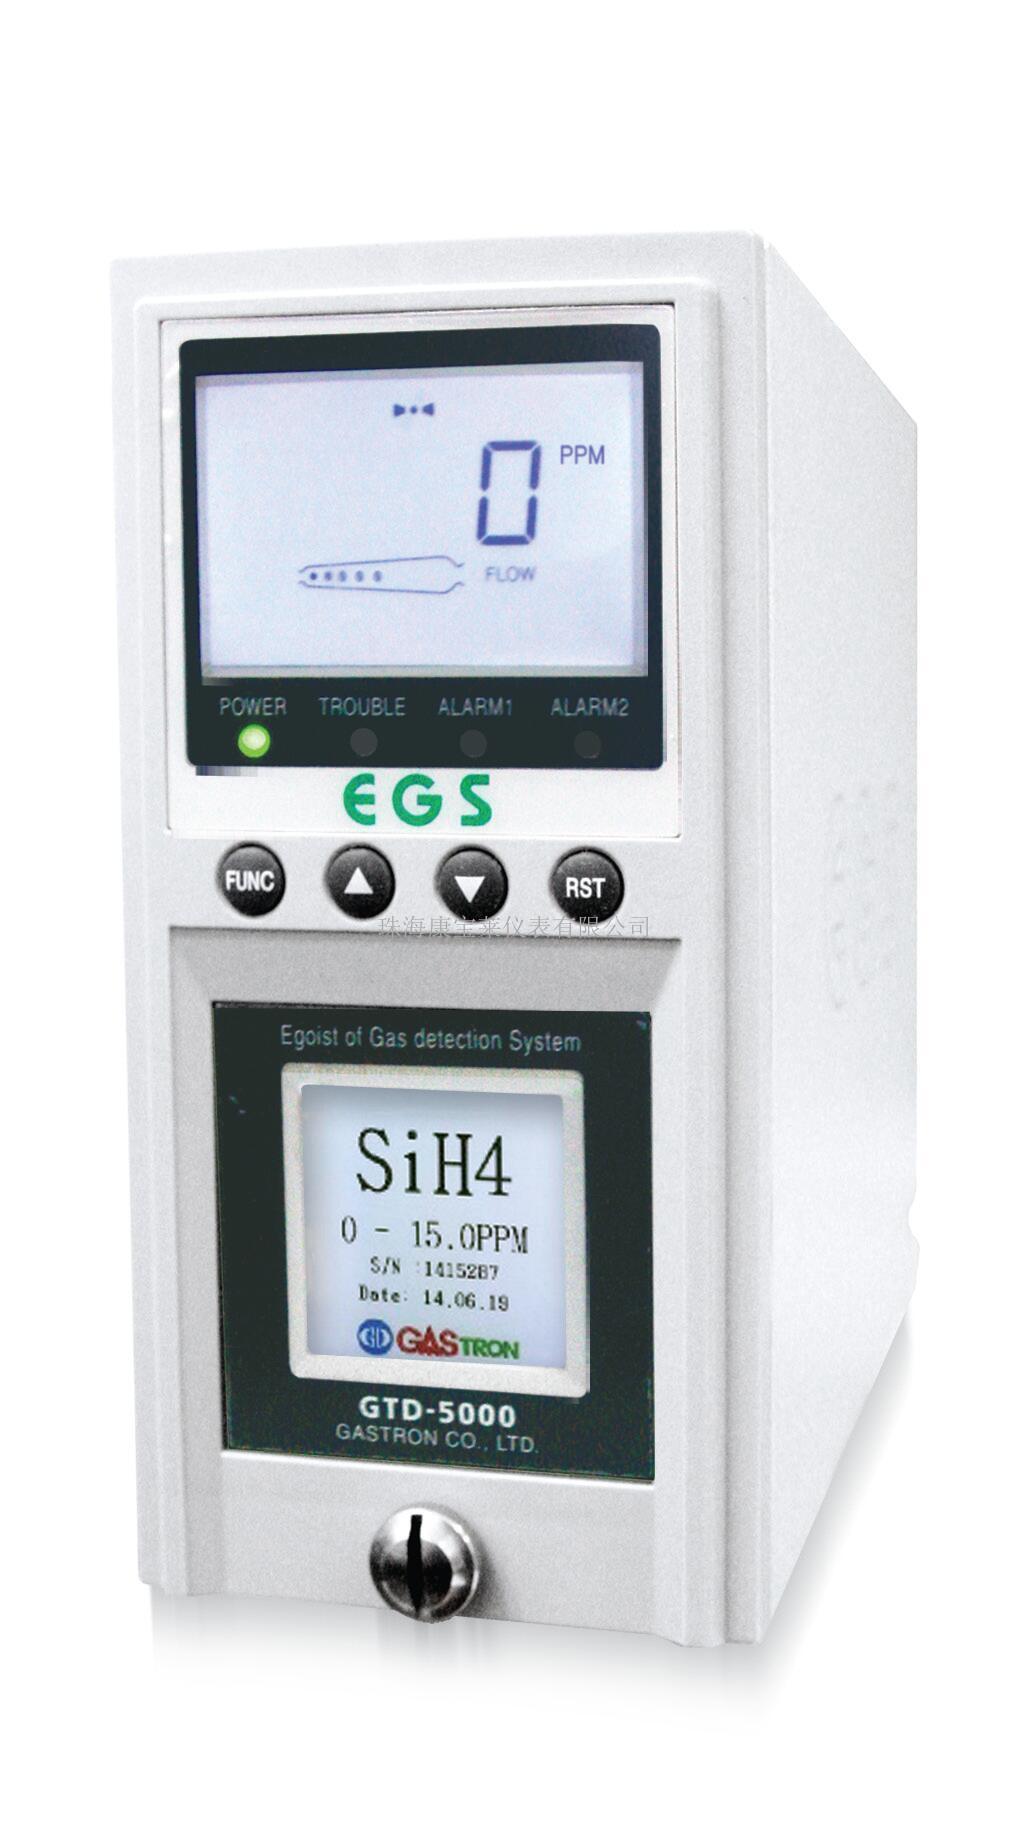 GASTRON固定泵吸式硼烷檢測儀 GTD-5000